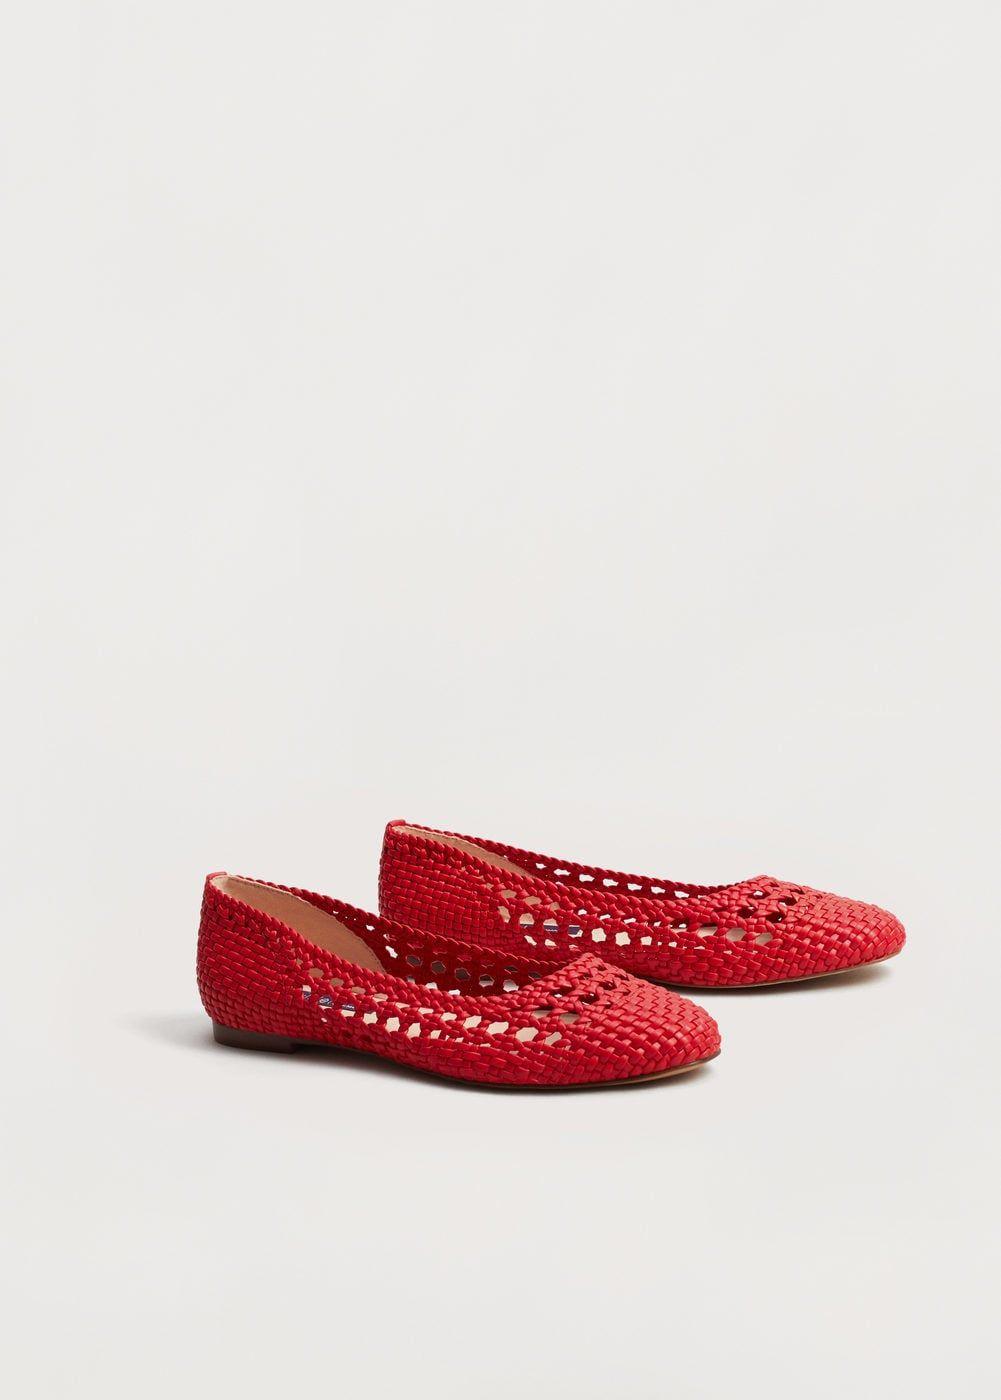 Tallas Mango Zapato Grandes Grandes Pinterest Trenzado 0WwCWZ5q